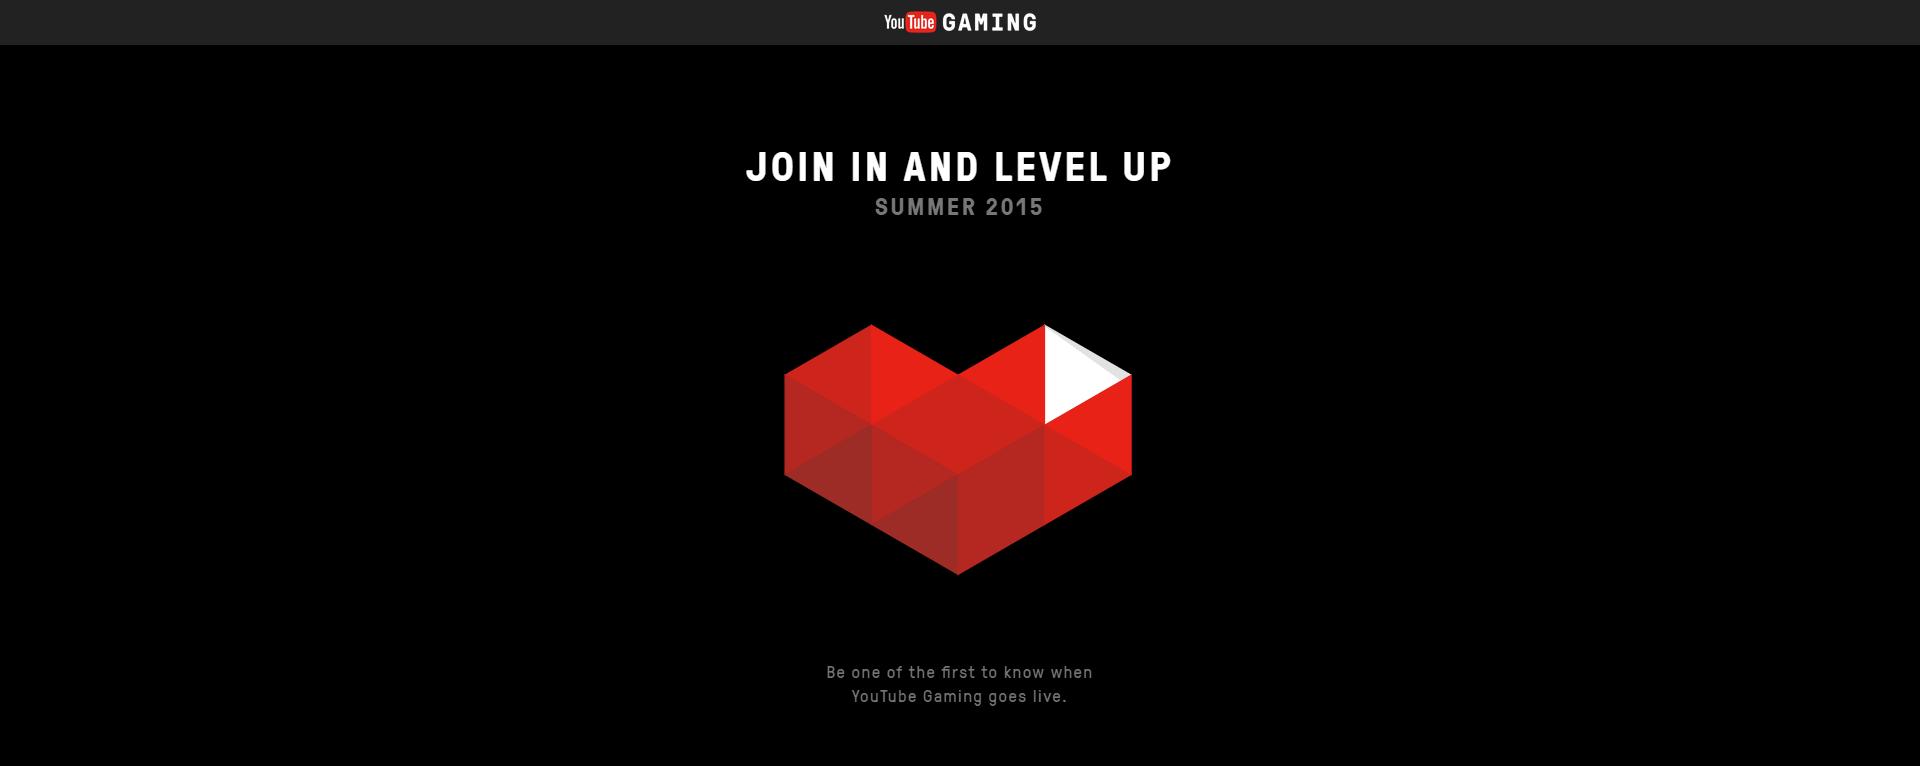 youtube gaming - 1919×625